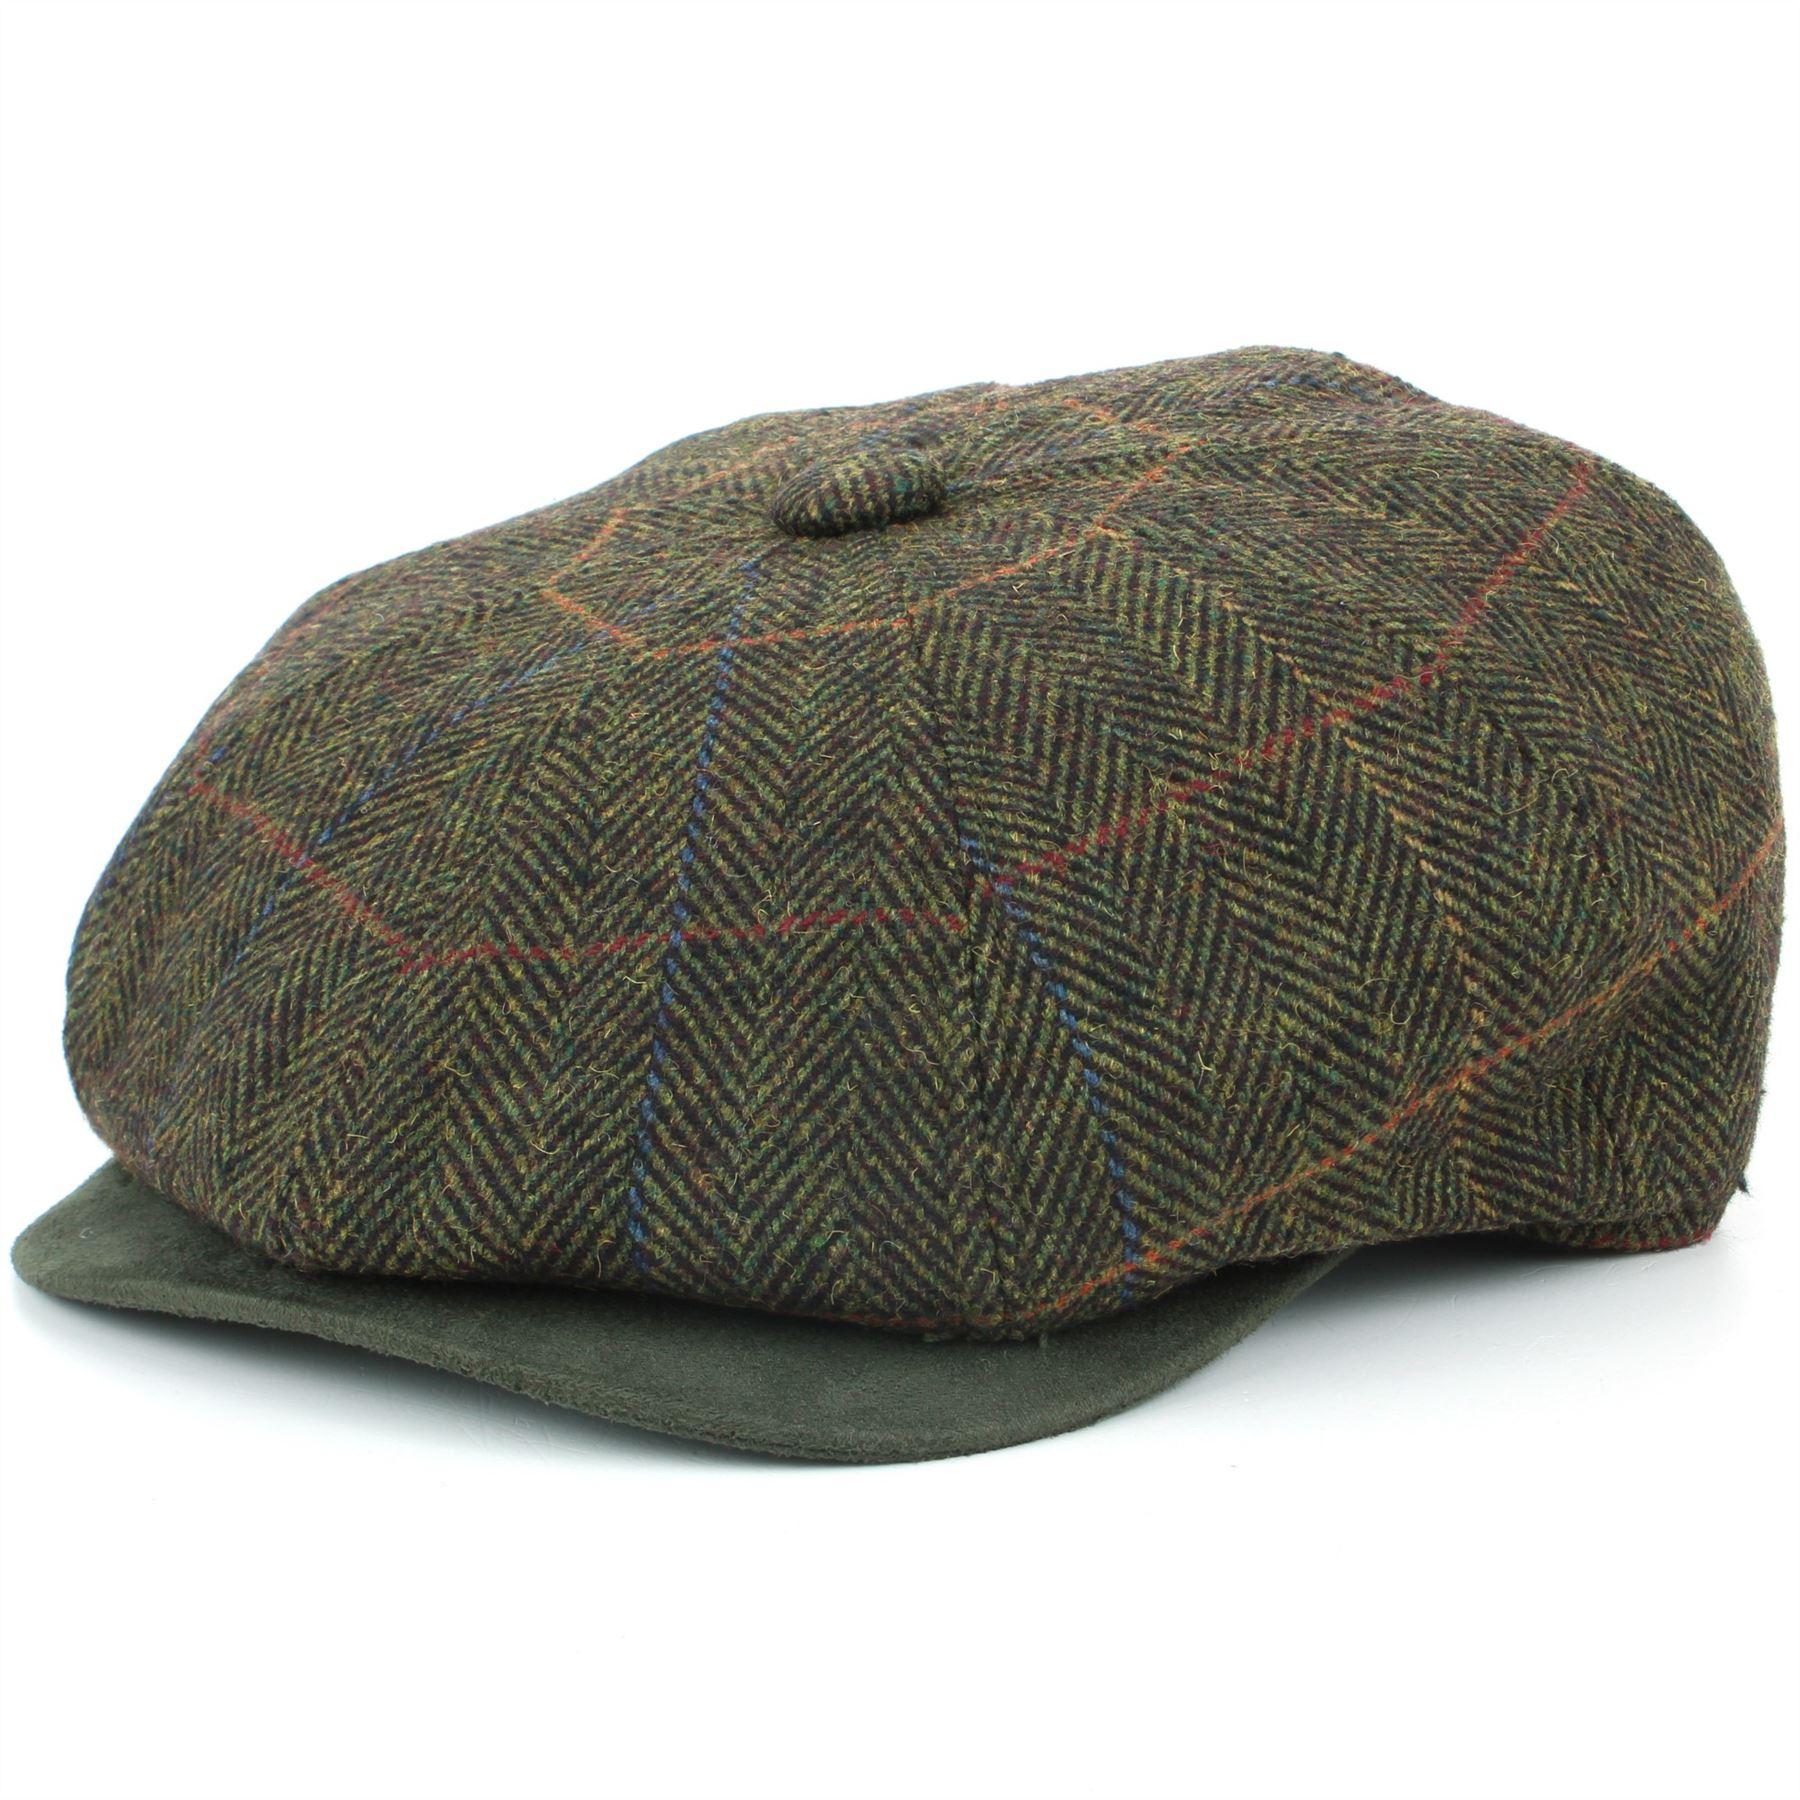 ce97fe1ebed90 Tweed Gatsby Newsboy Hat BLUE GREEN Flat Cap Peaky Blinders Hawkins ...